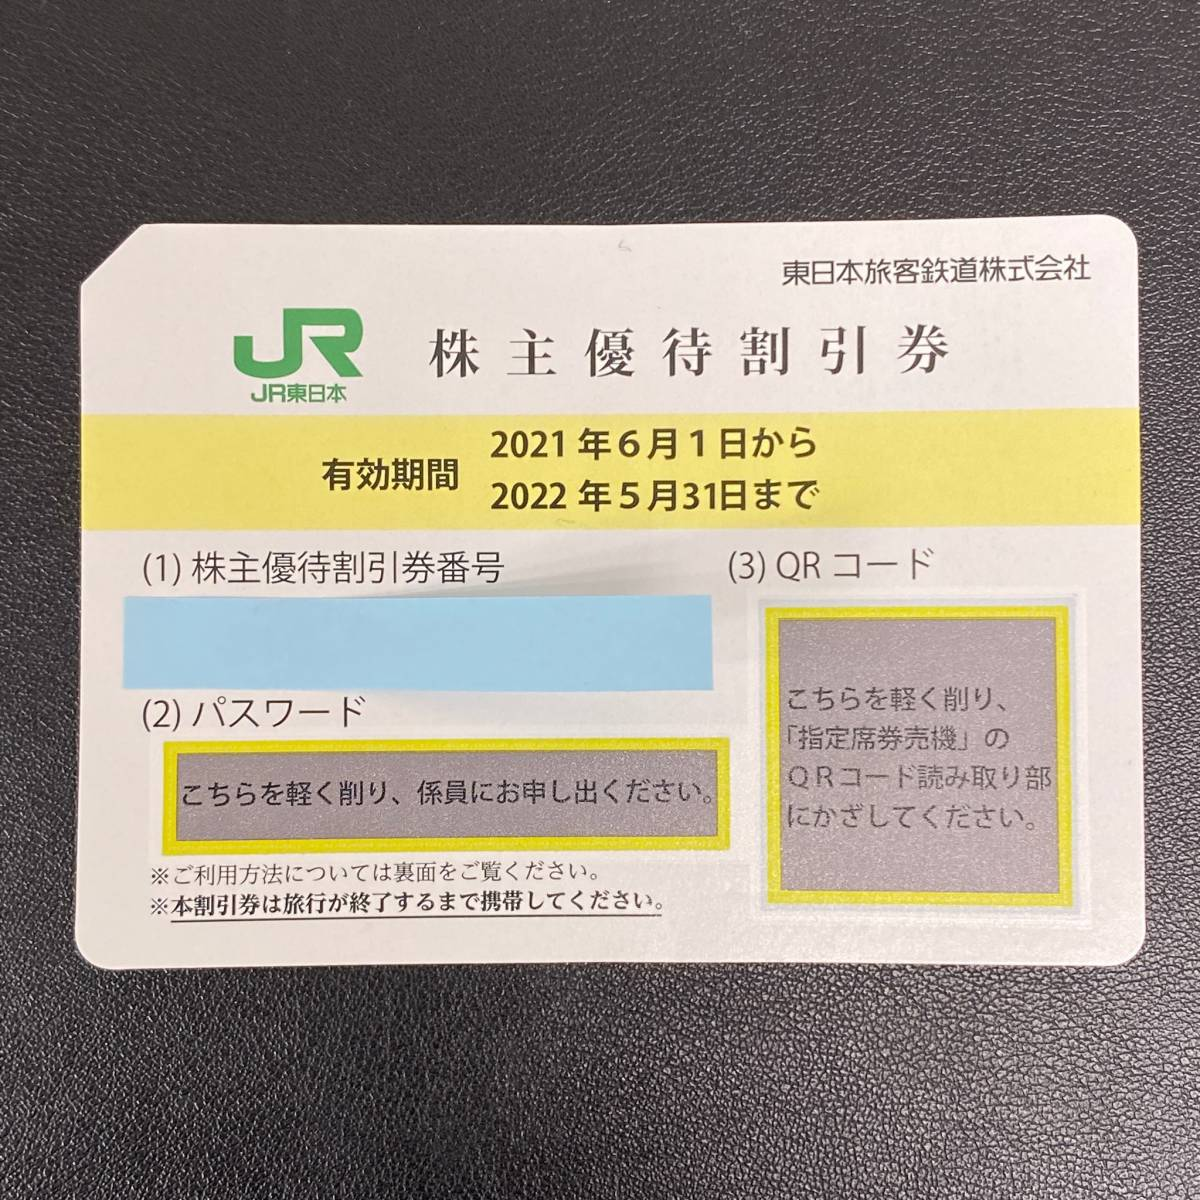 【A4912】東日本旅客鉄道 株主優待 株主優待割引券(1枚) 有効期限 2022年5月31日 運賃・料金4割引 JR東日本 _画像1